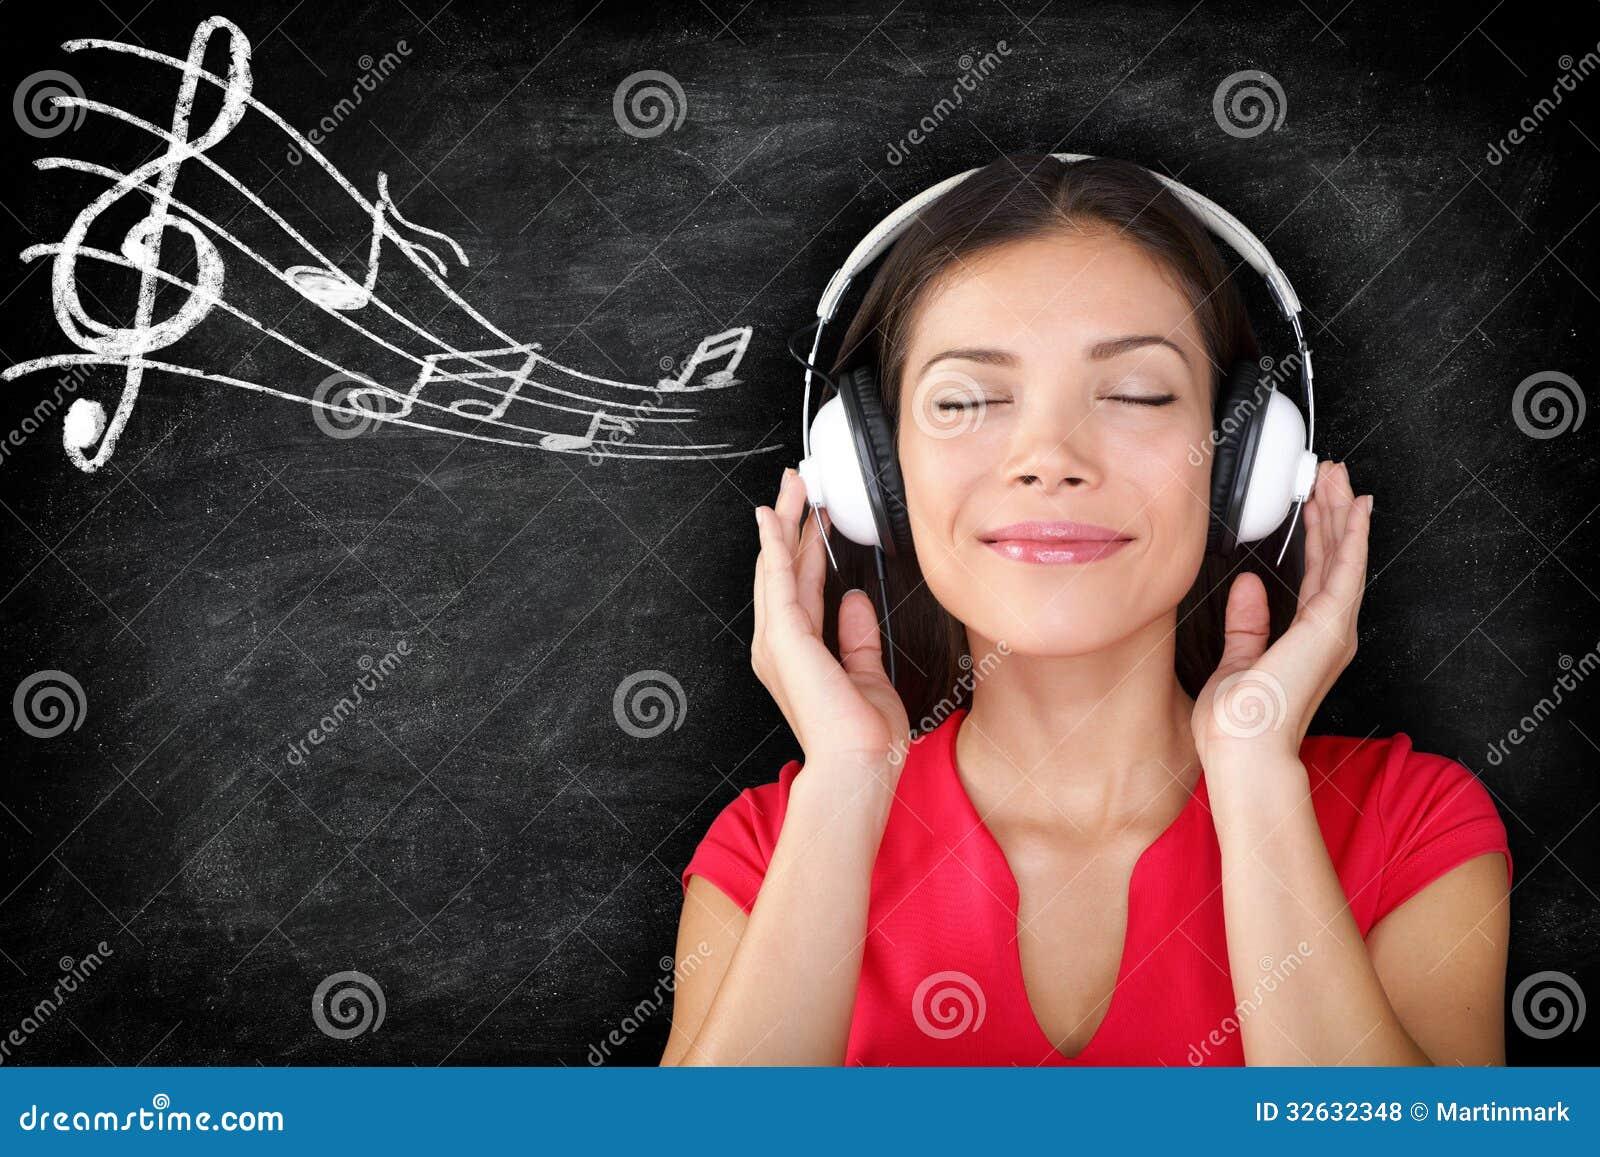 https://thumbs.dreamstime.com/z/музыка-наушники-женщины-нося-с-ушая-к-музыке-32632348.jpg